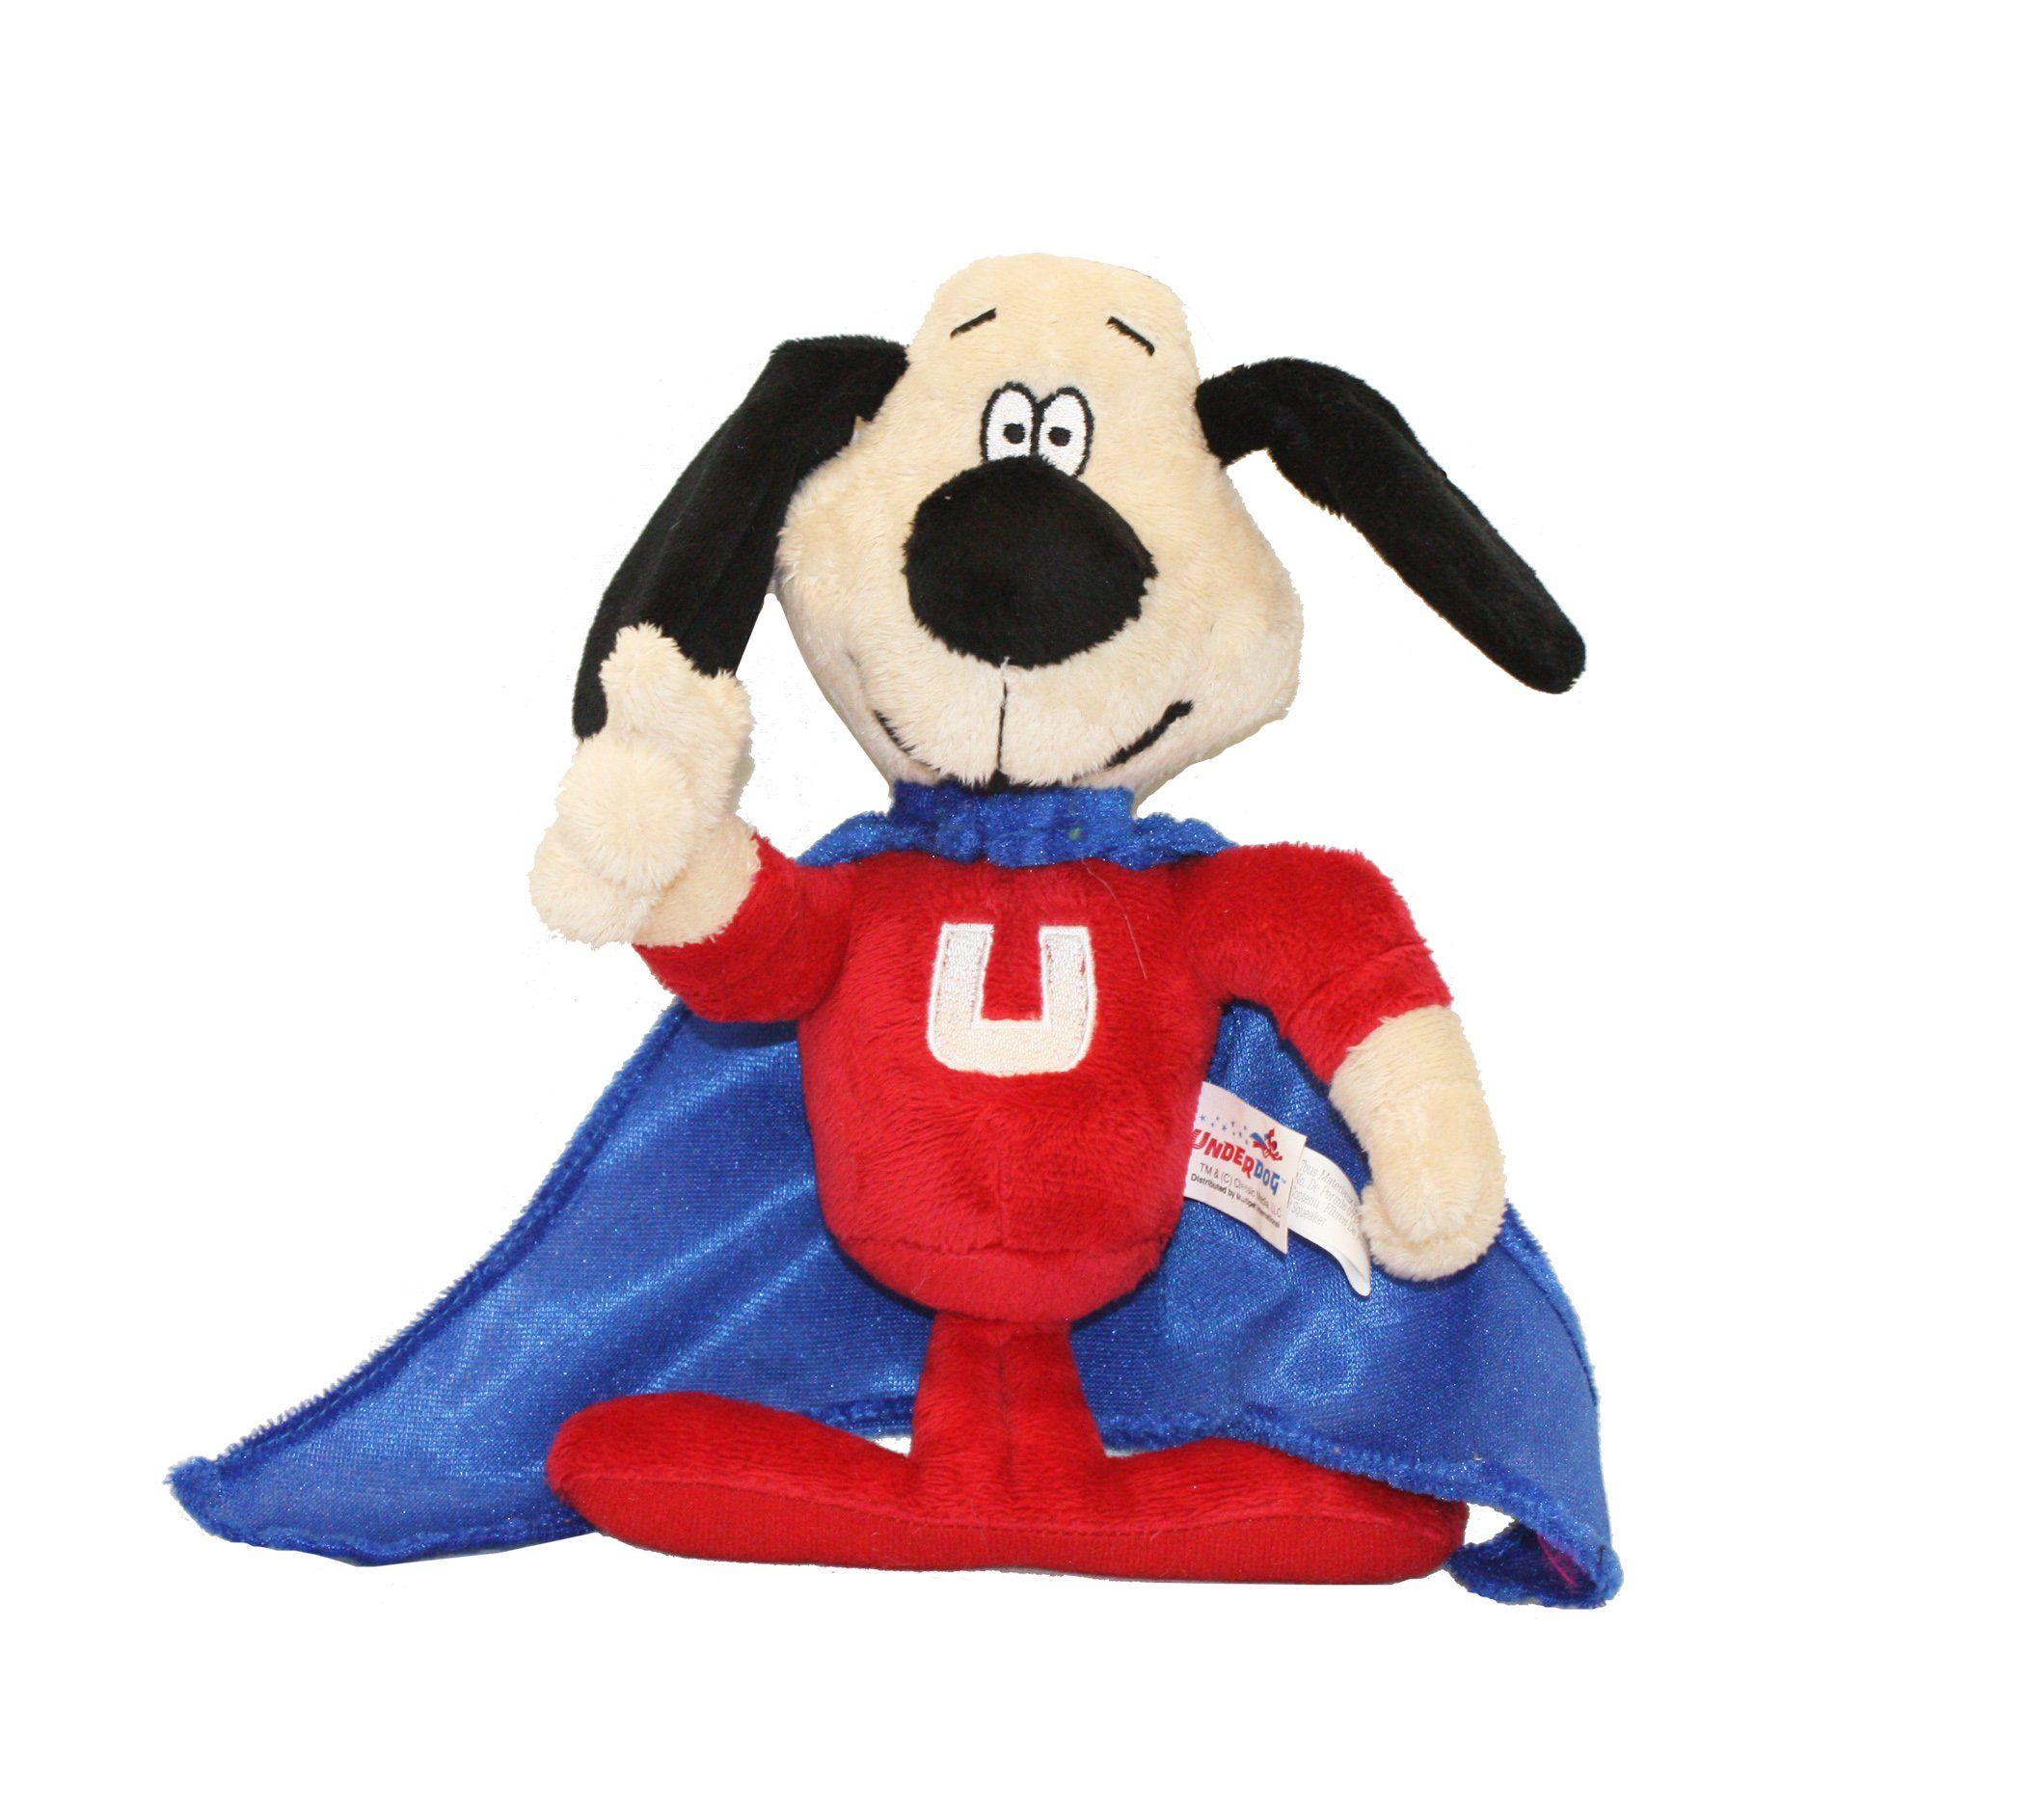 Multipet Officially Licensed Underdog Talking Dog Toy 9inch